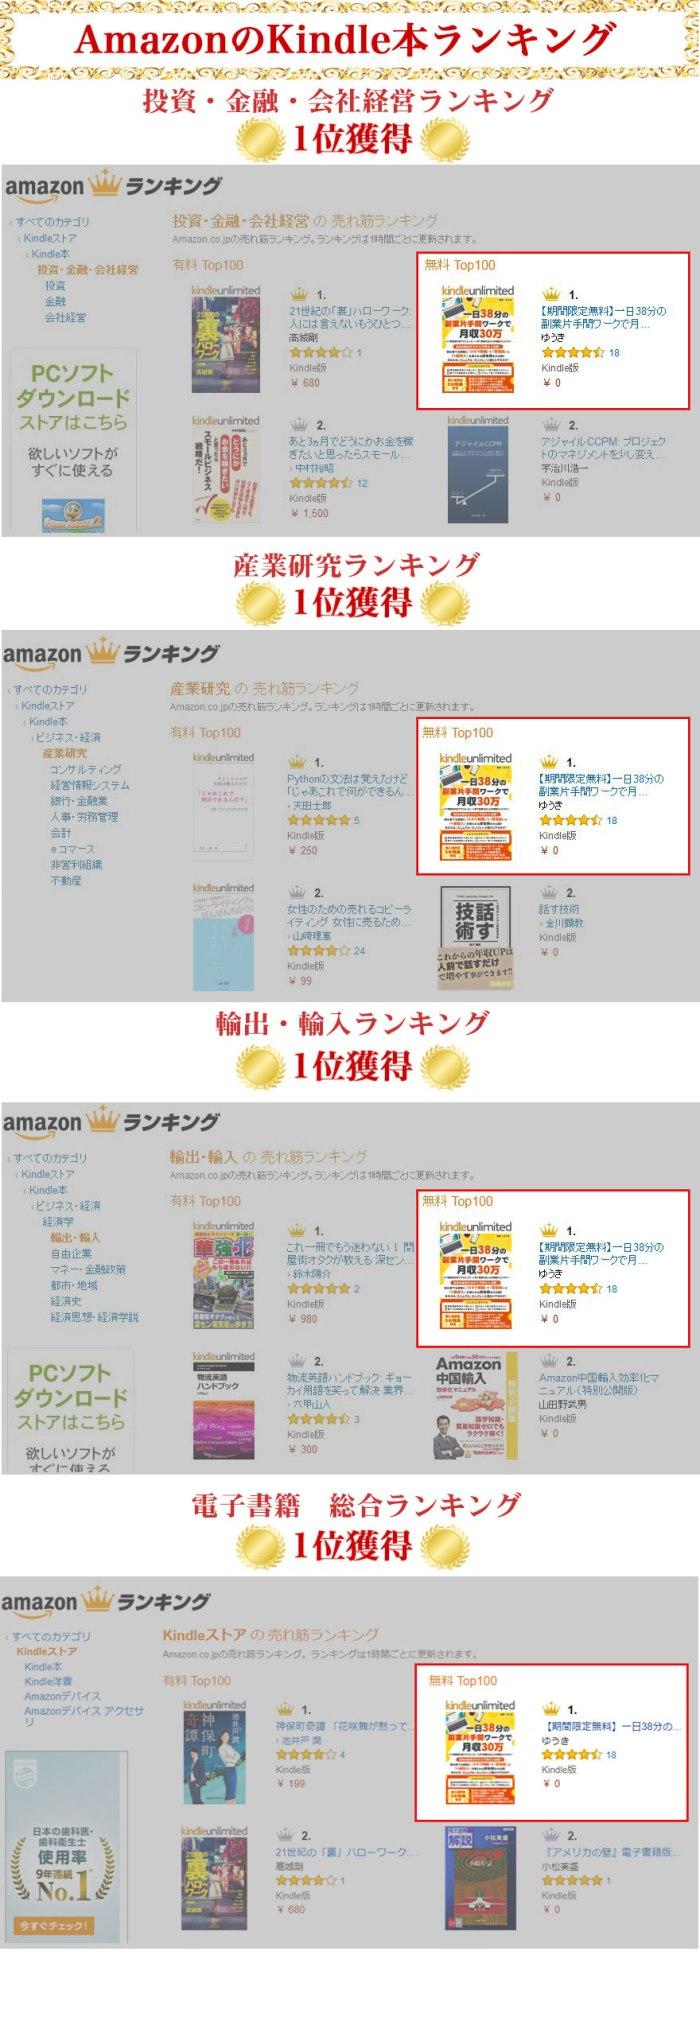 ranking 電子書籍1位を獲得!!